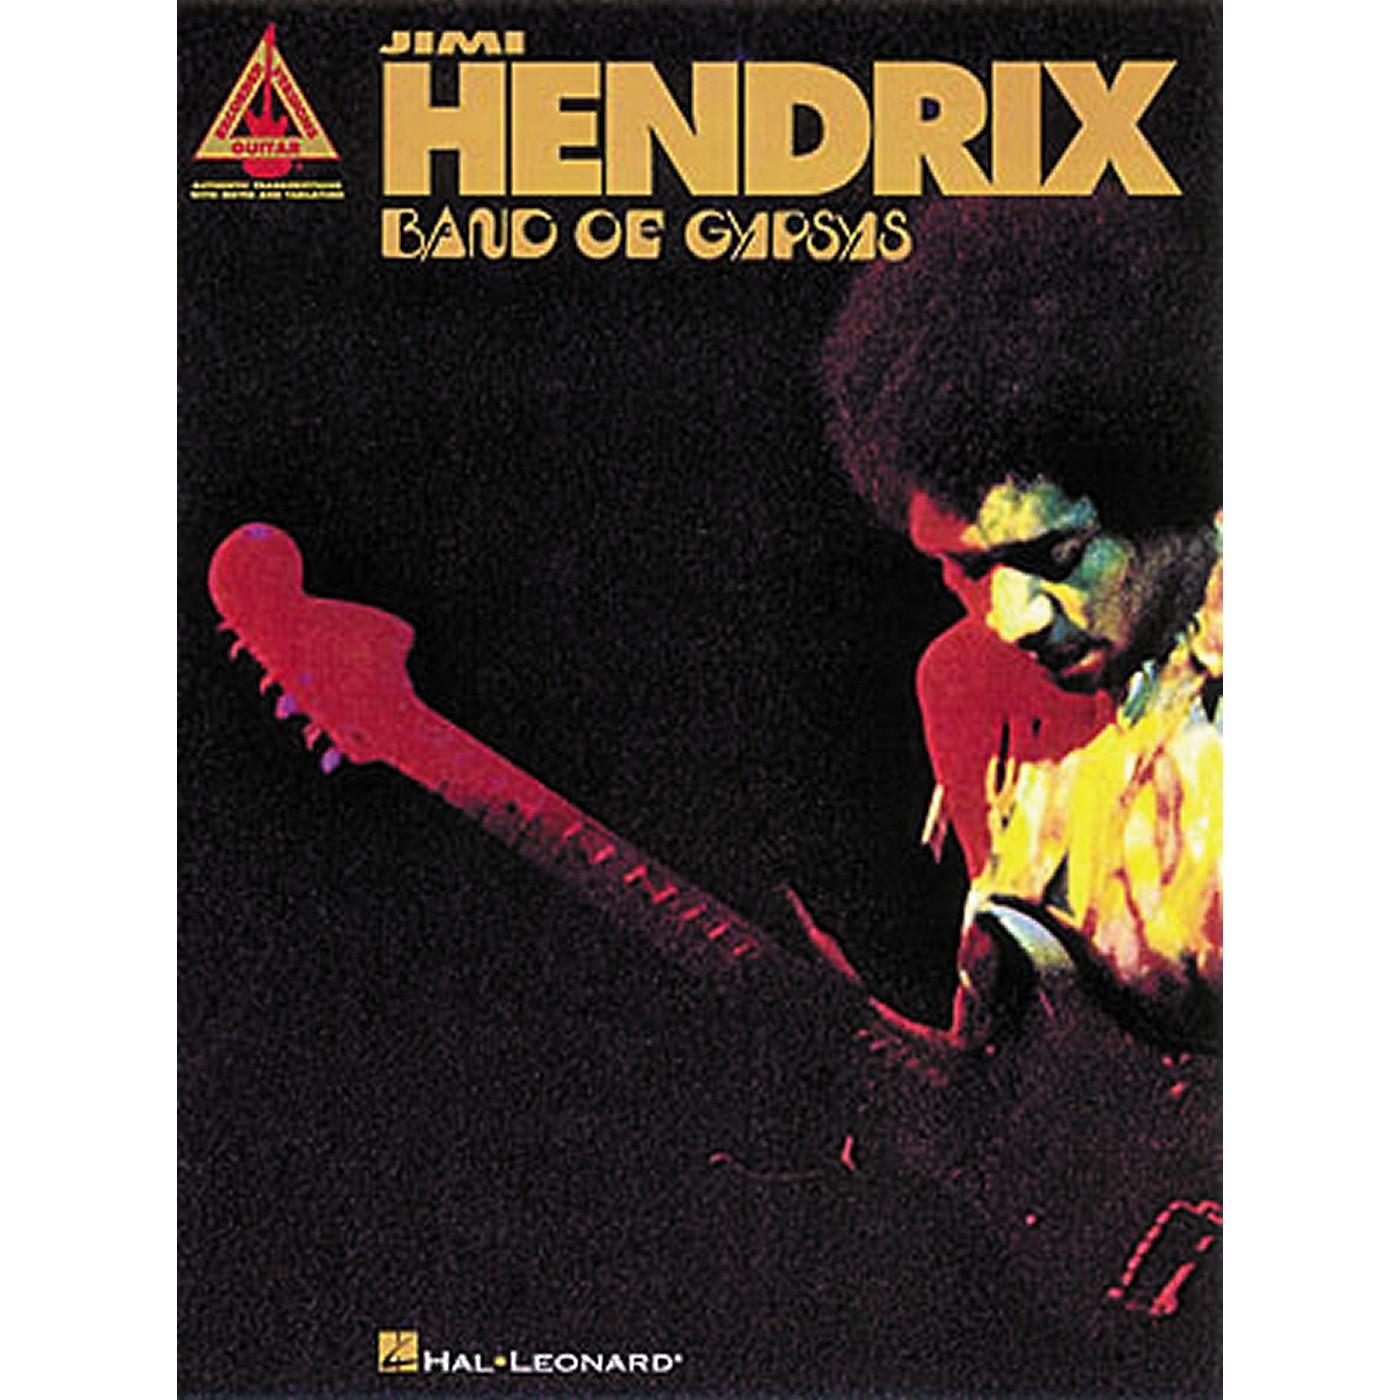 Hal Leonard Jimi Hendrix Band of Gypsys Guitar Tab Songbook thumbnail